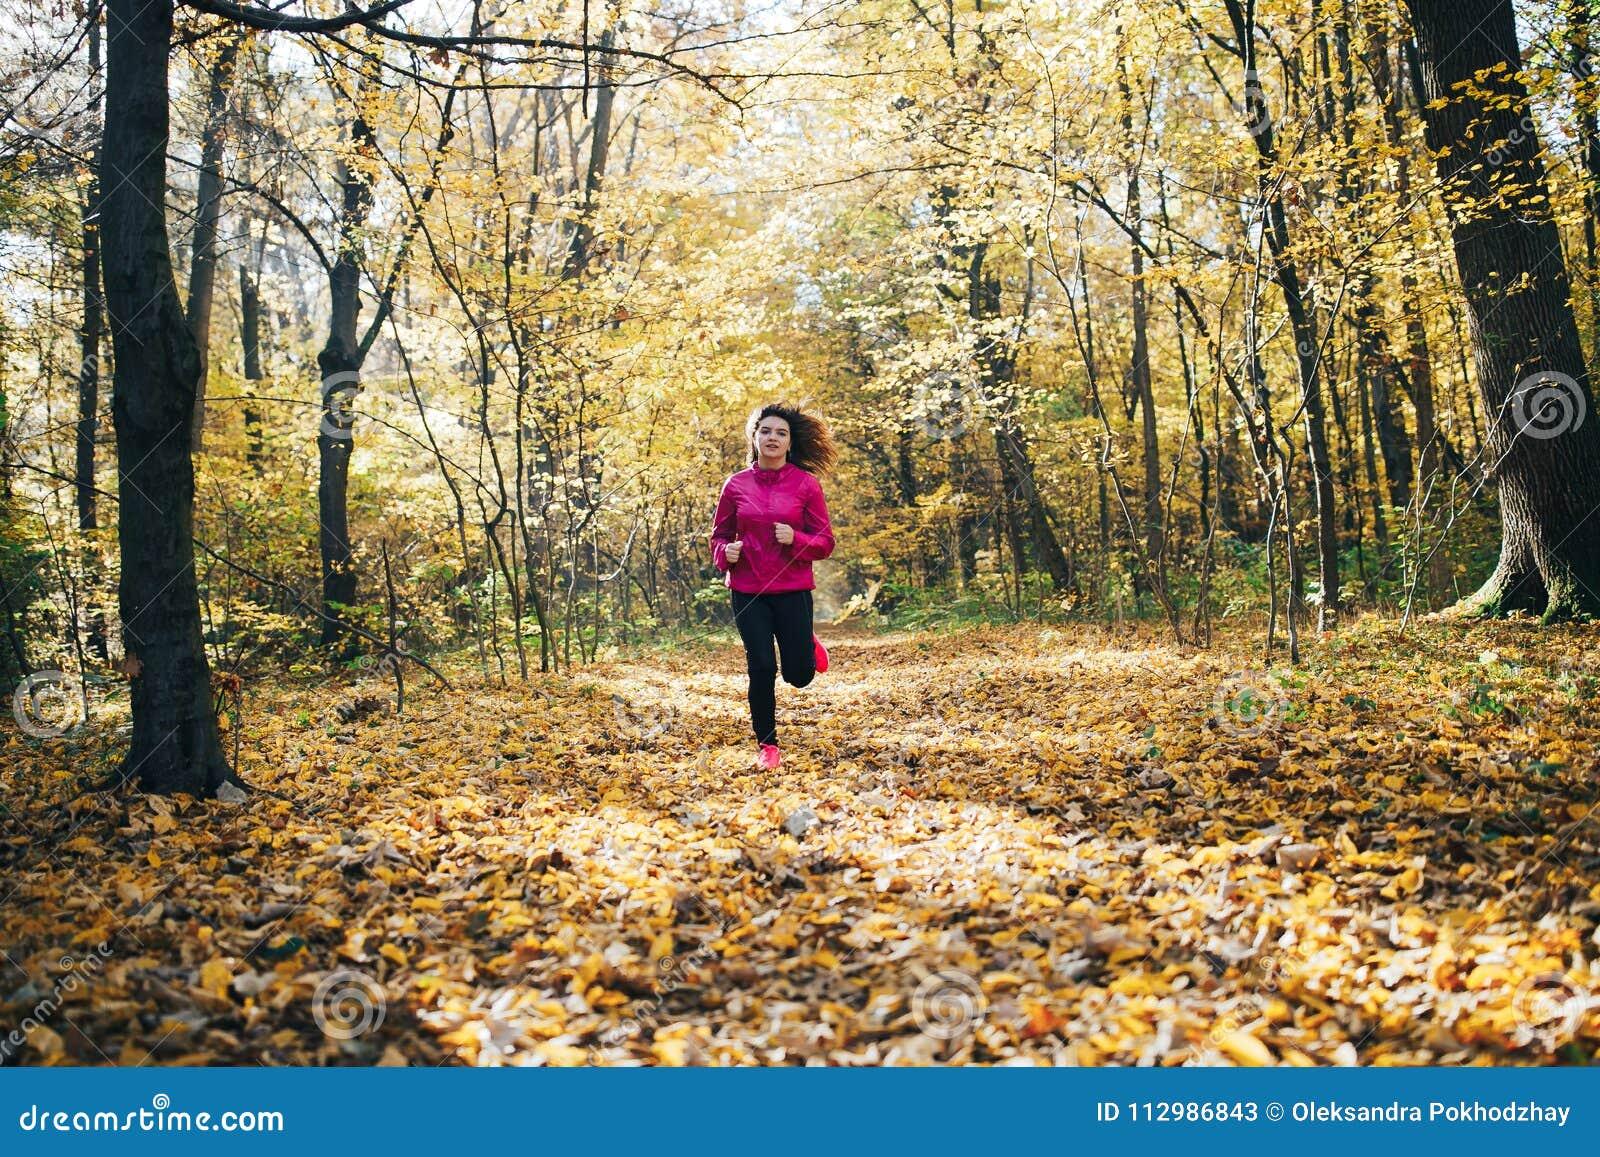 Woman running during morning park